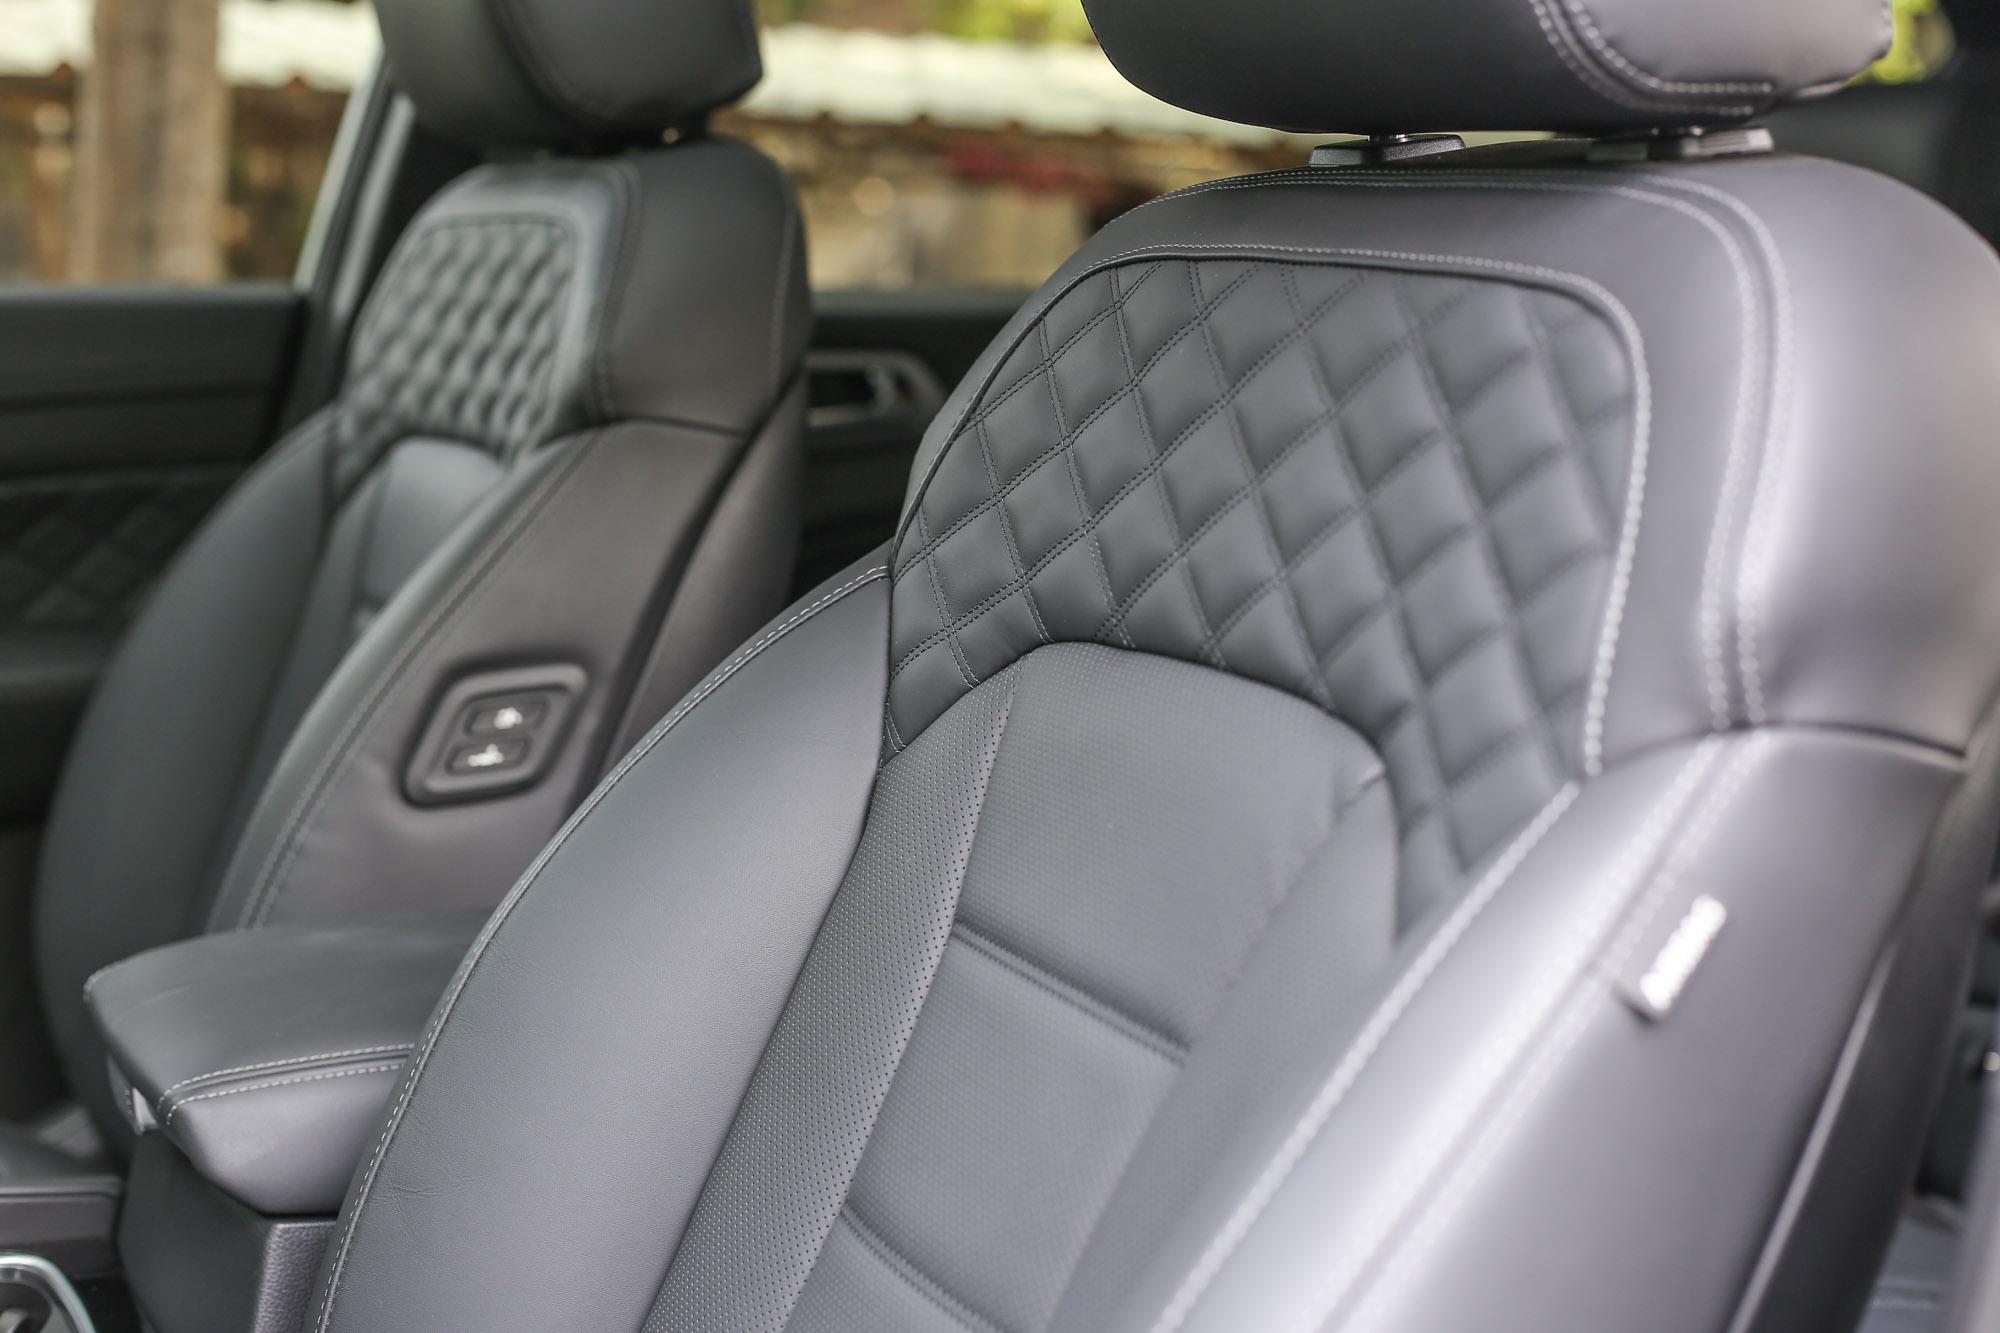 Nappa 皮革包覆再加上菱格紋的座椅,還有駕駛座電動四向腰背調整功能等。